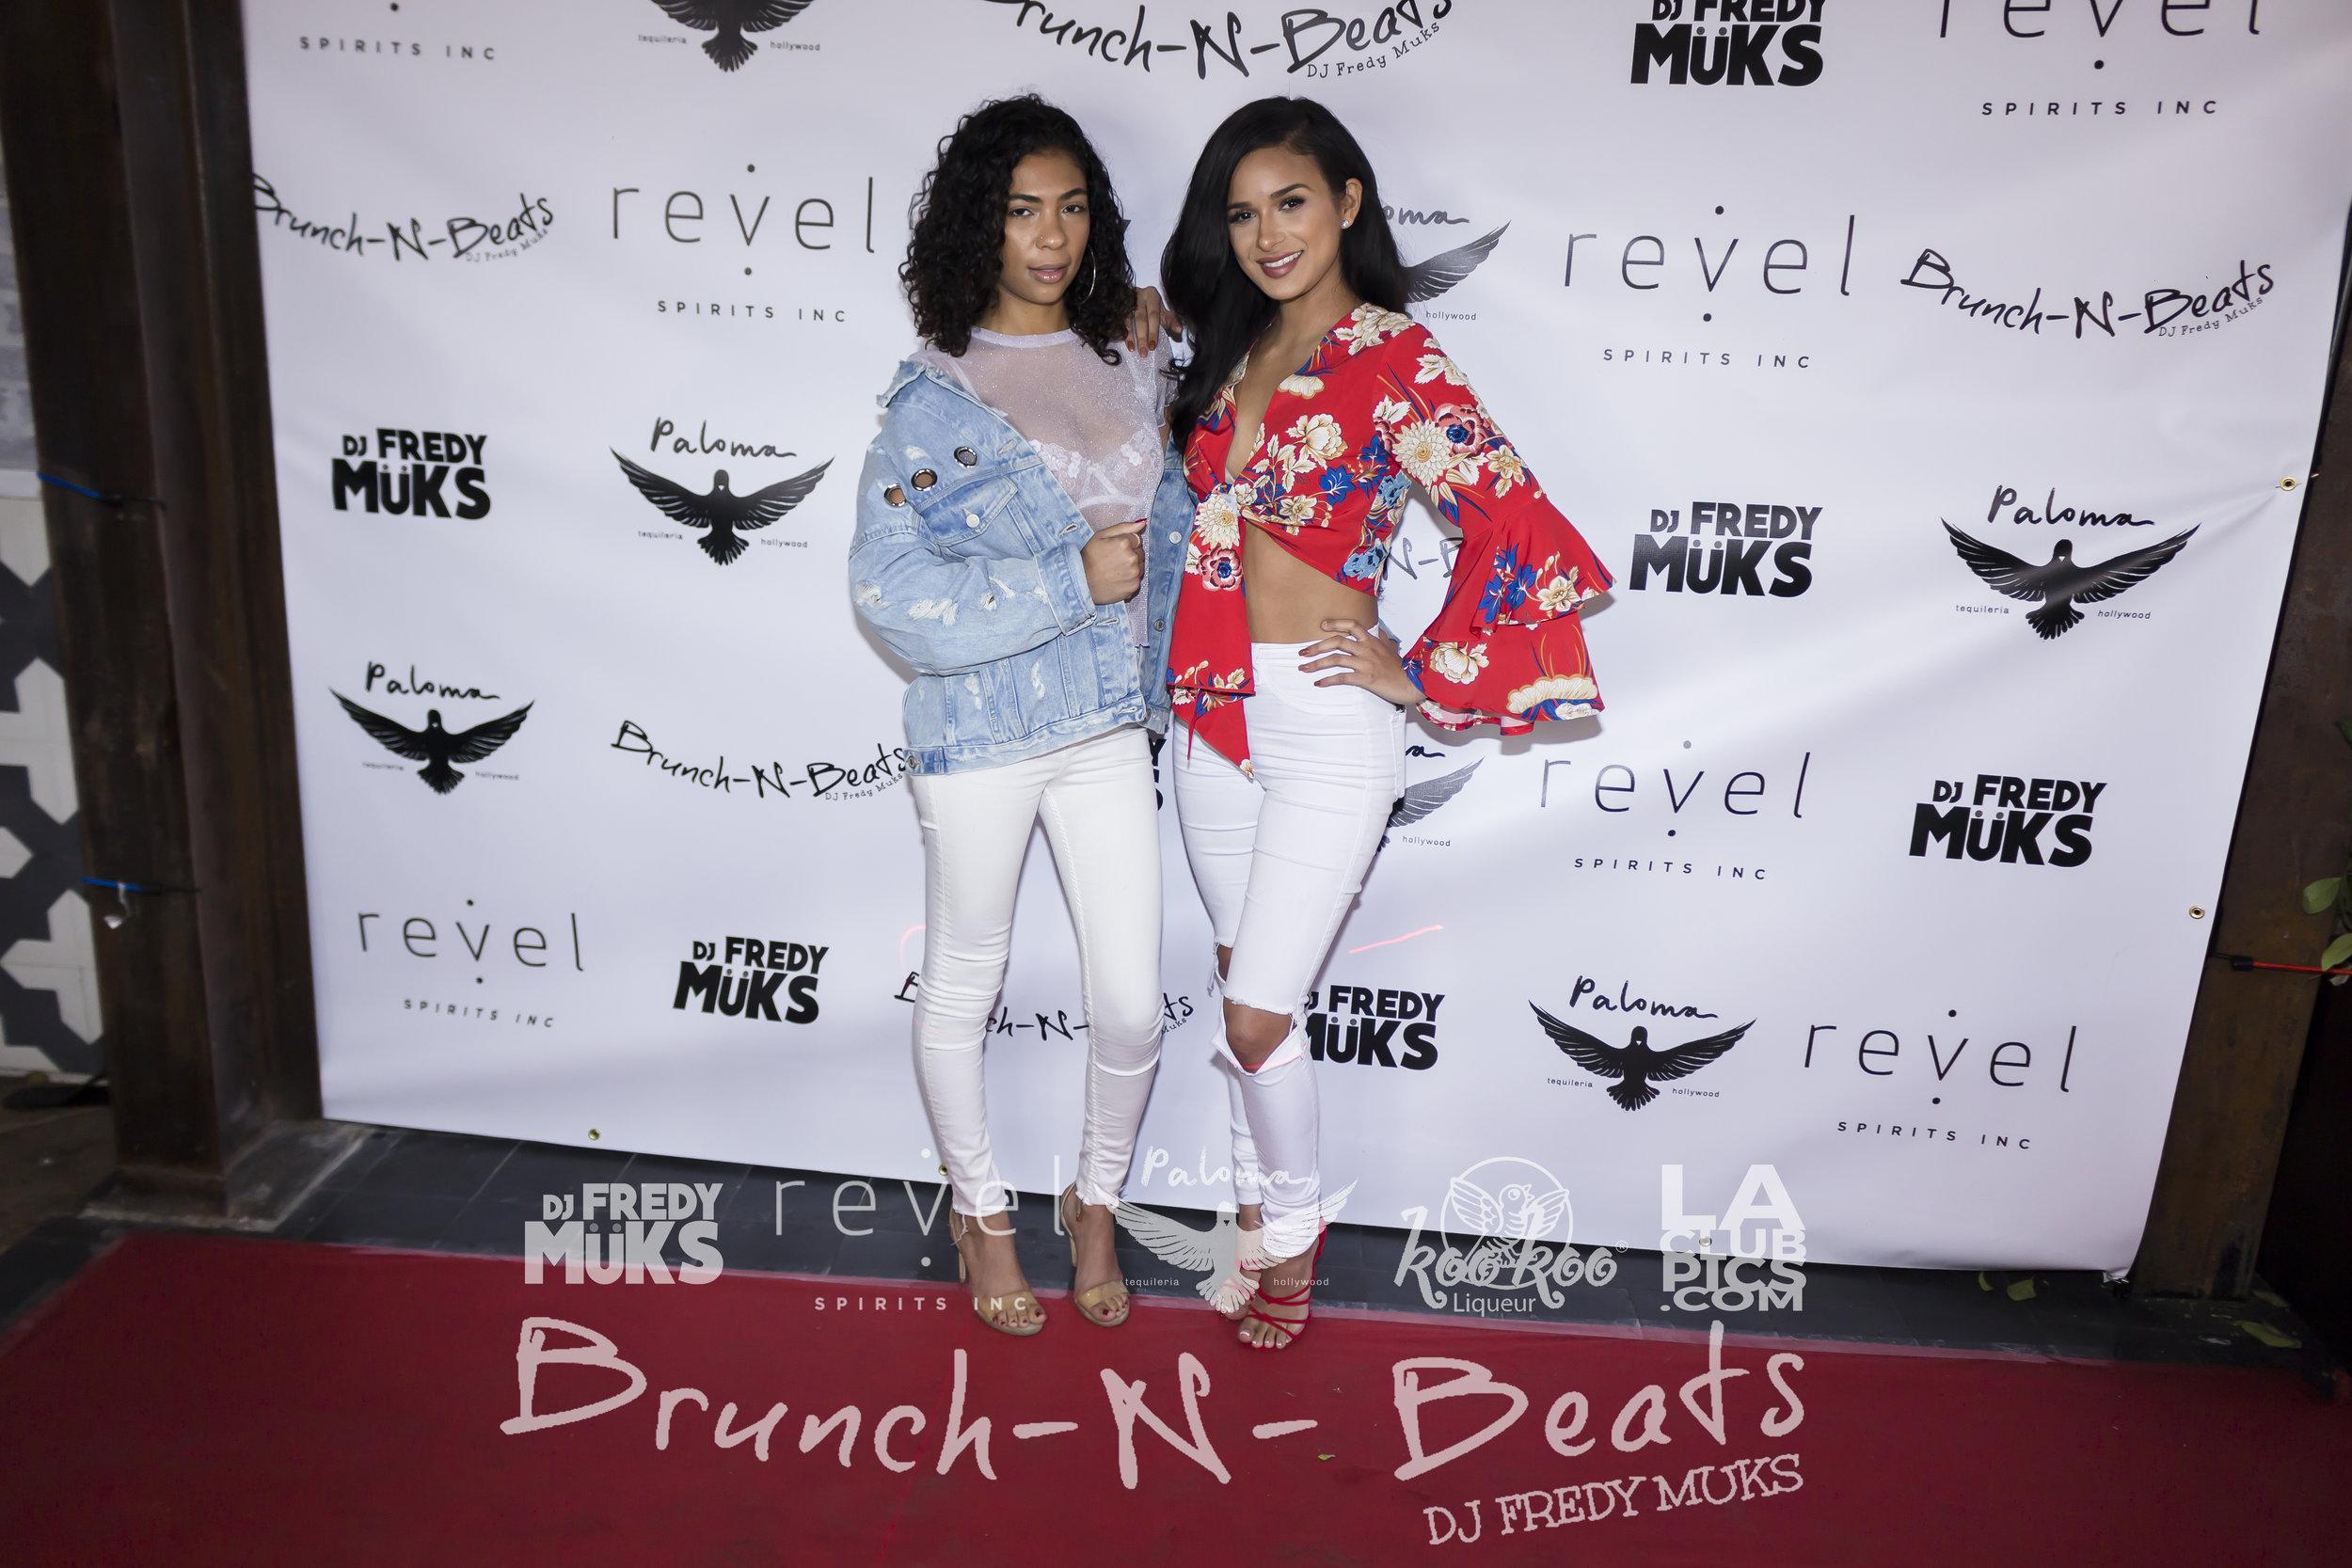 Brunch-N-Beats - Paloma Hollywood - 02-25-18_27.jpg